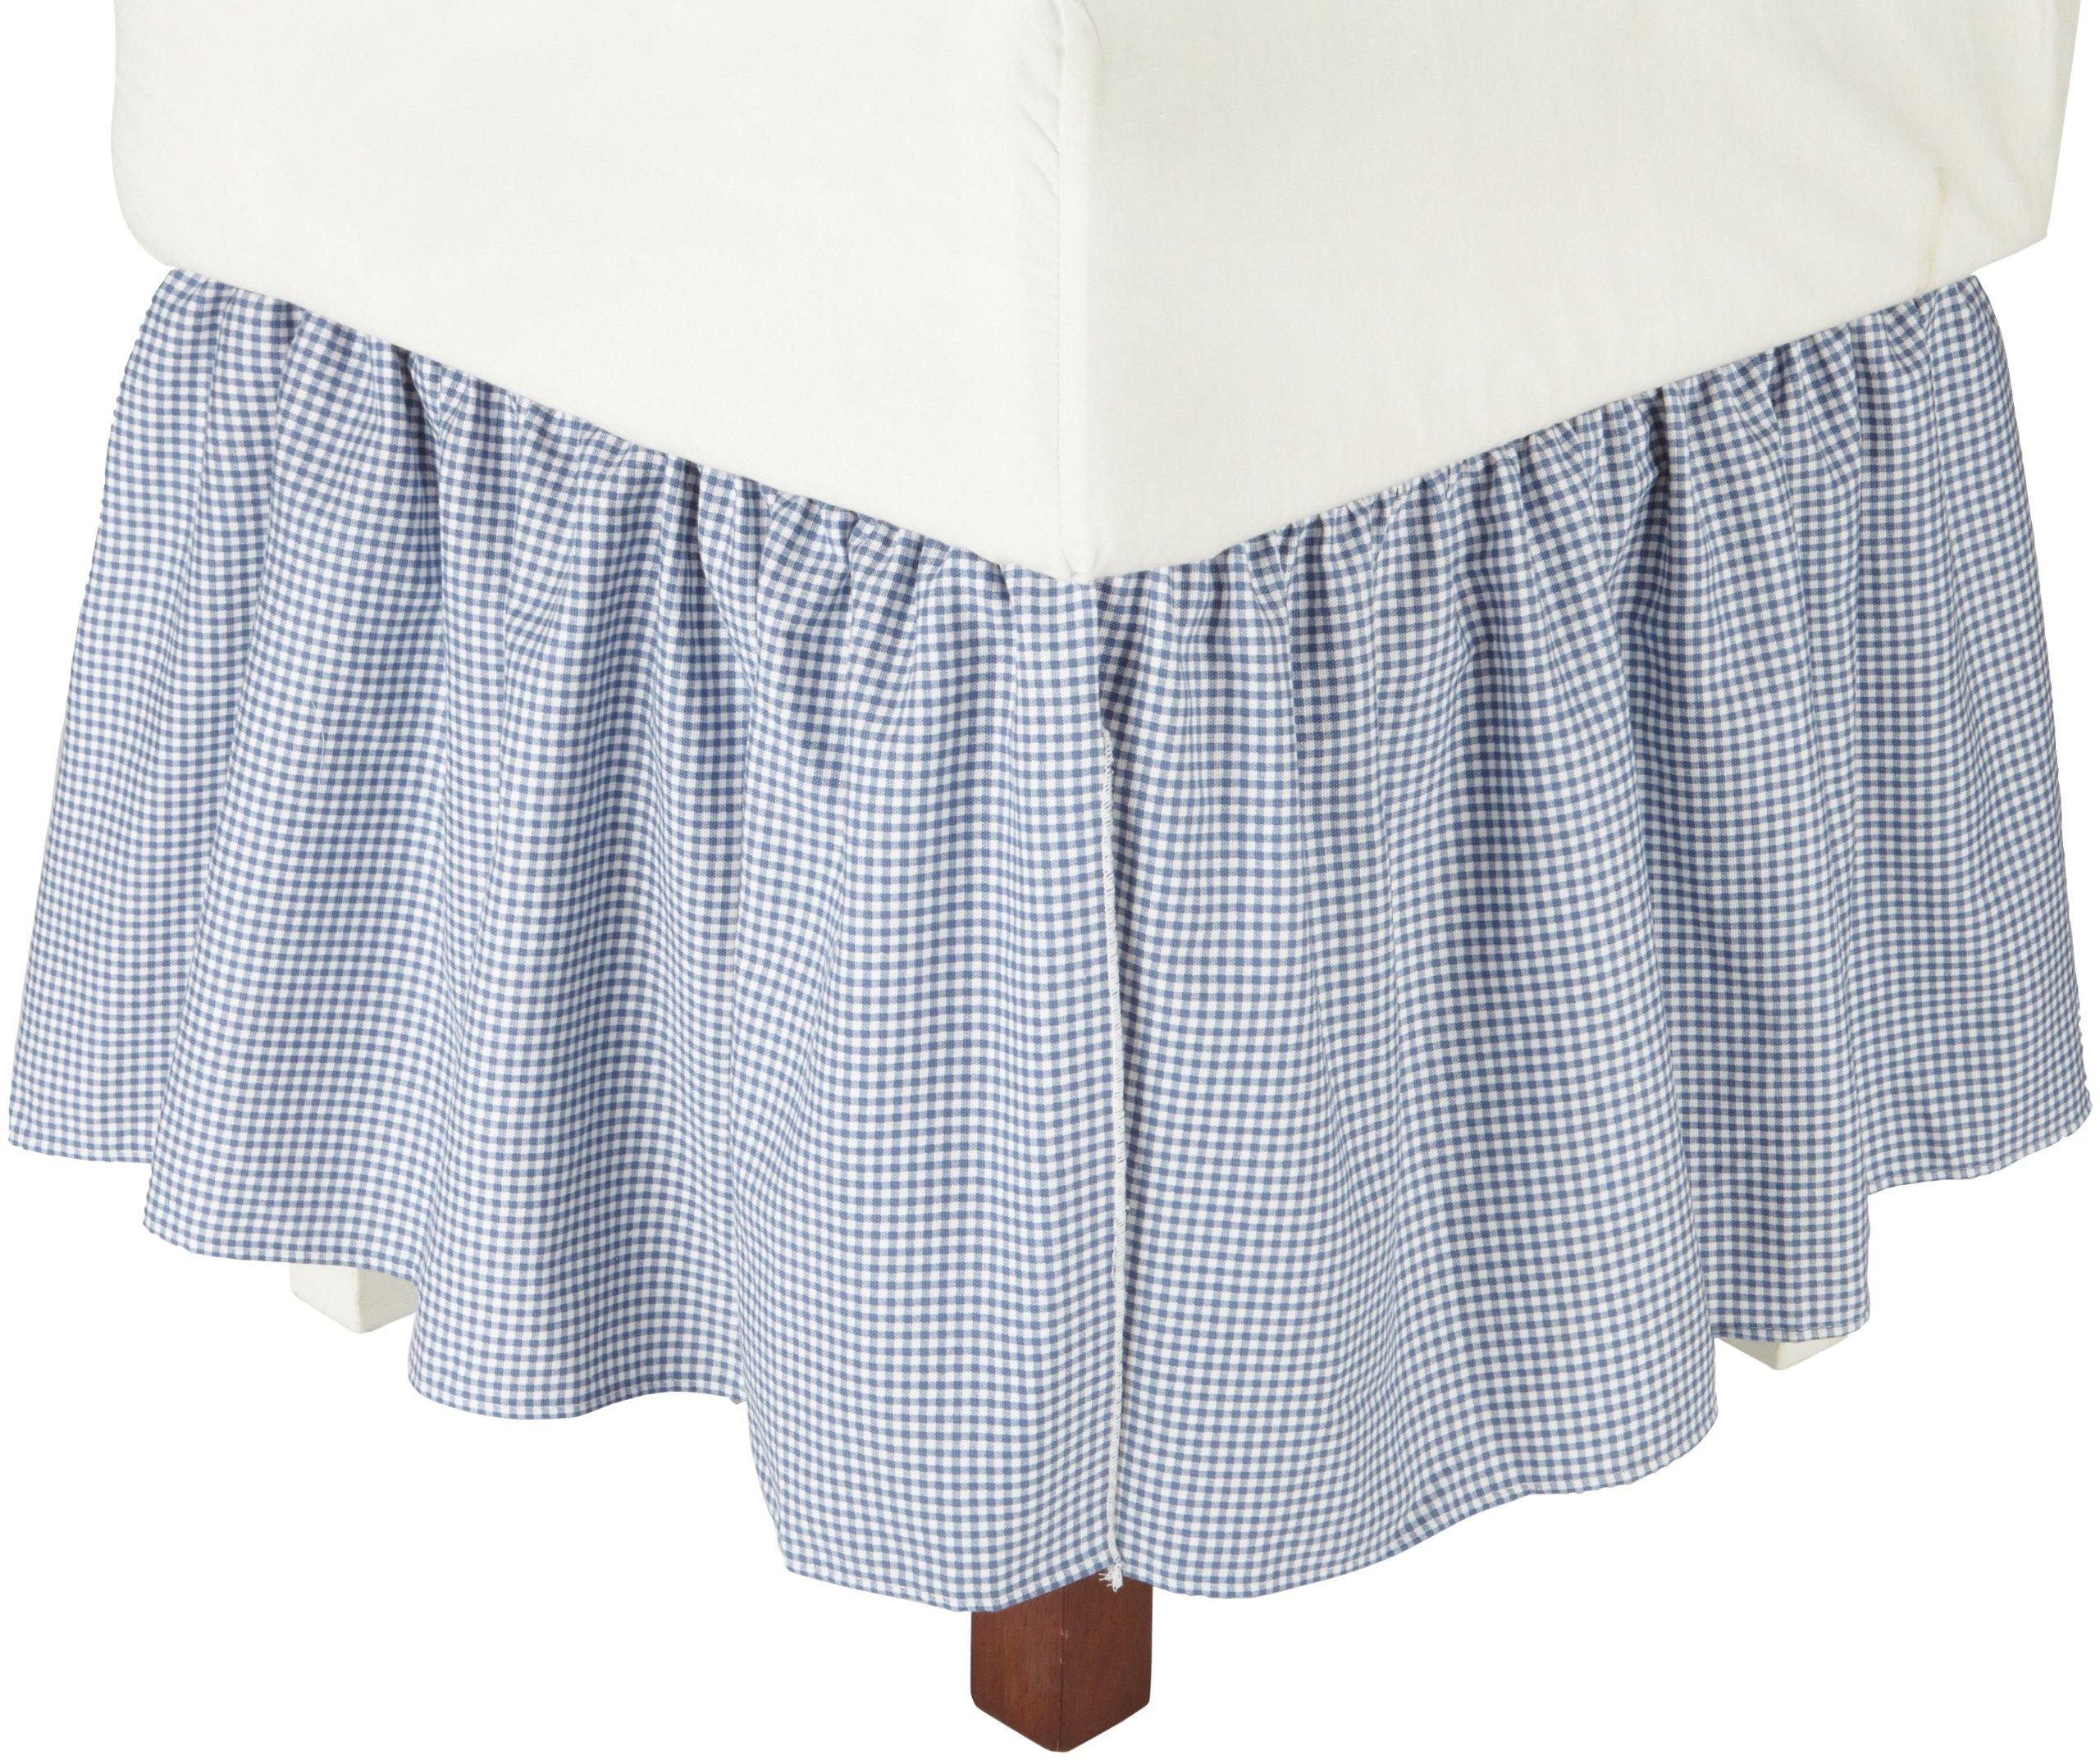 Logan Gingham Check Print 18 Inch Dust Ruffle Bed Skirt